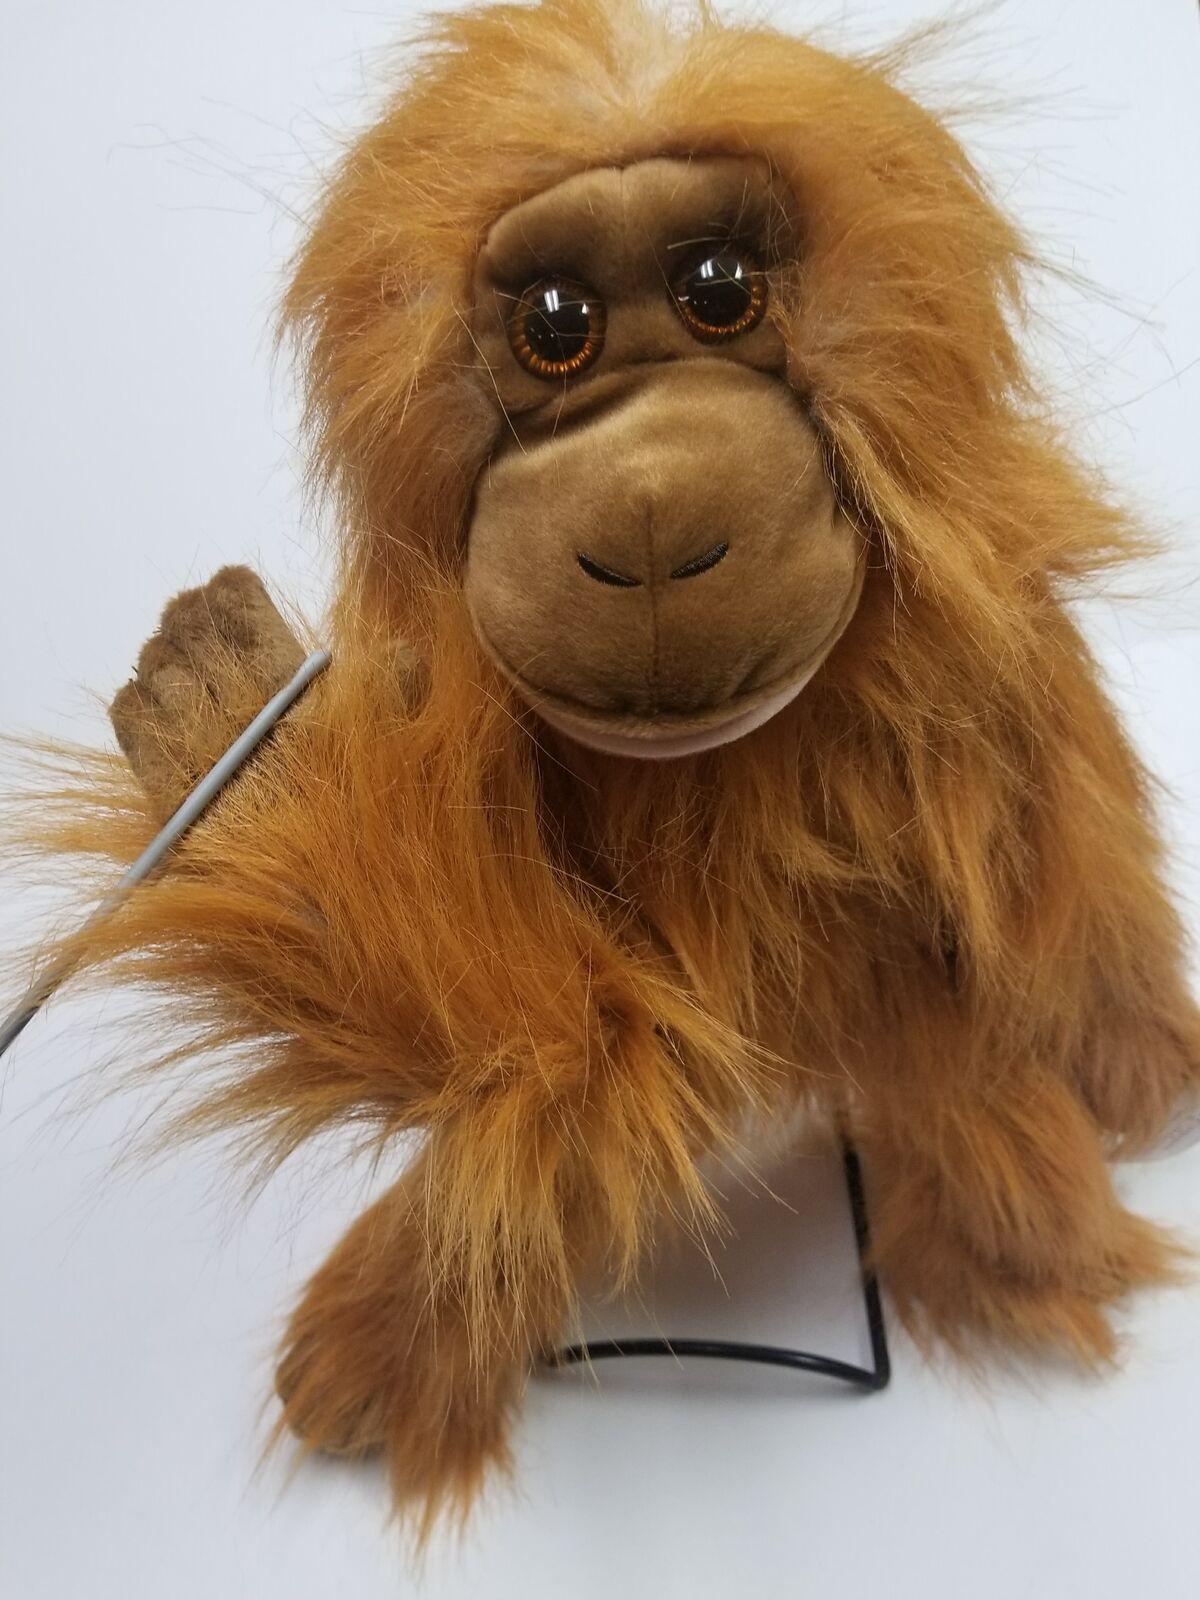 Puppet Company colorful Monkey - Orangutan - Bundle with Arm Rod